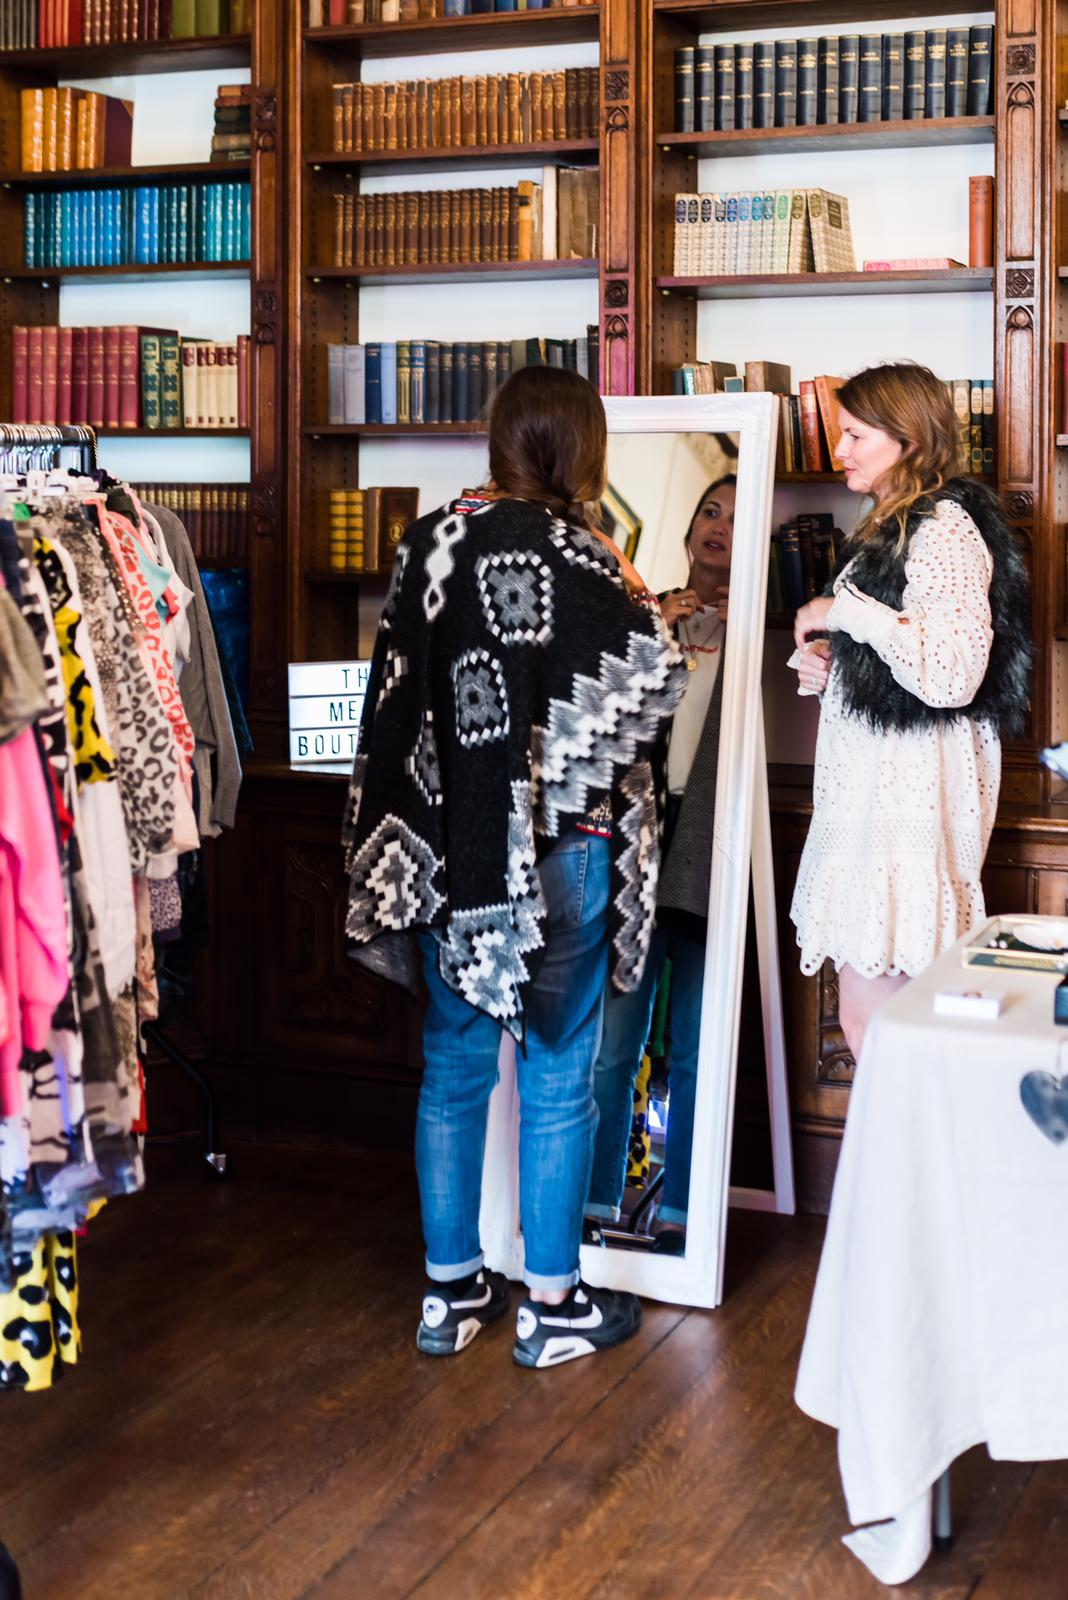 fashion-reboot-mums-the-word-event-tunbridge-wells-kent-support-local-magazine.JPG-7.JPG